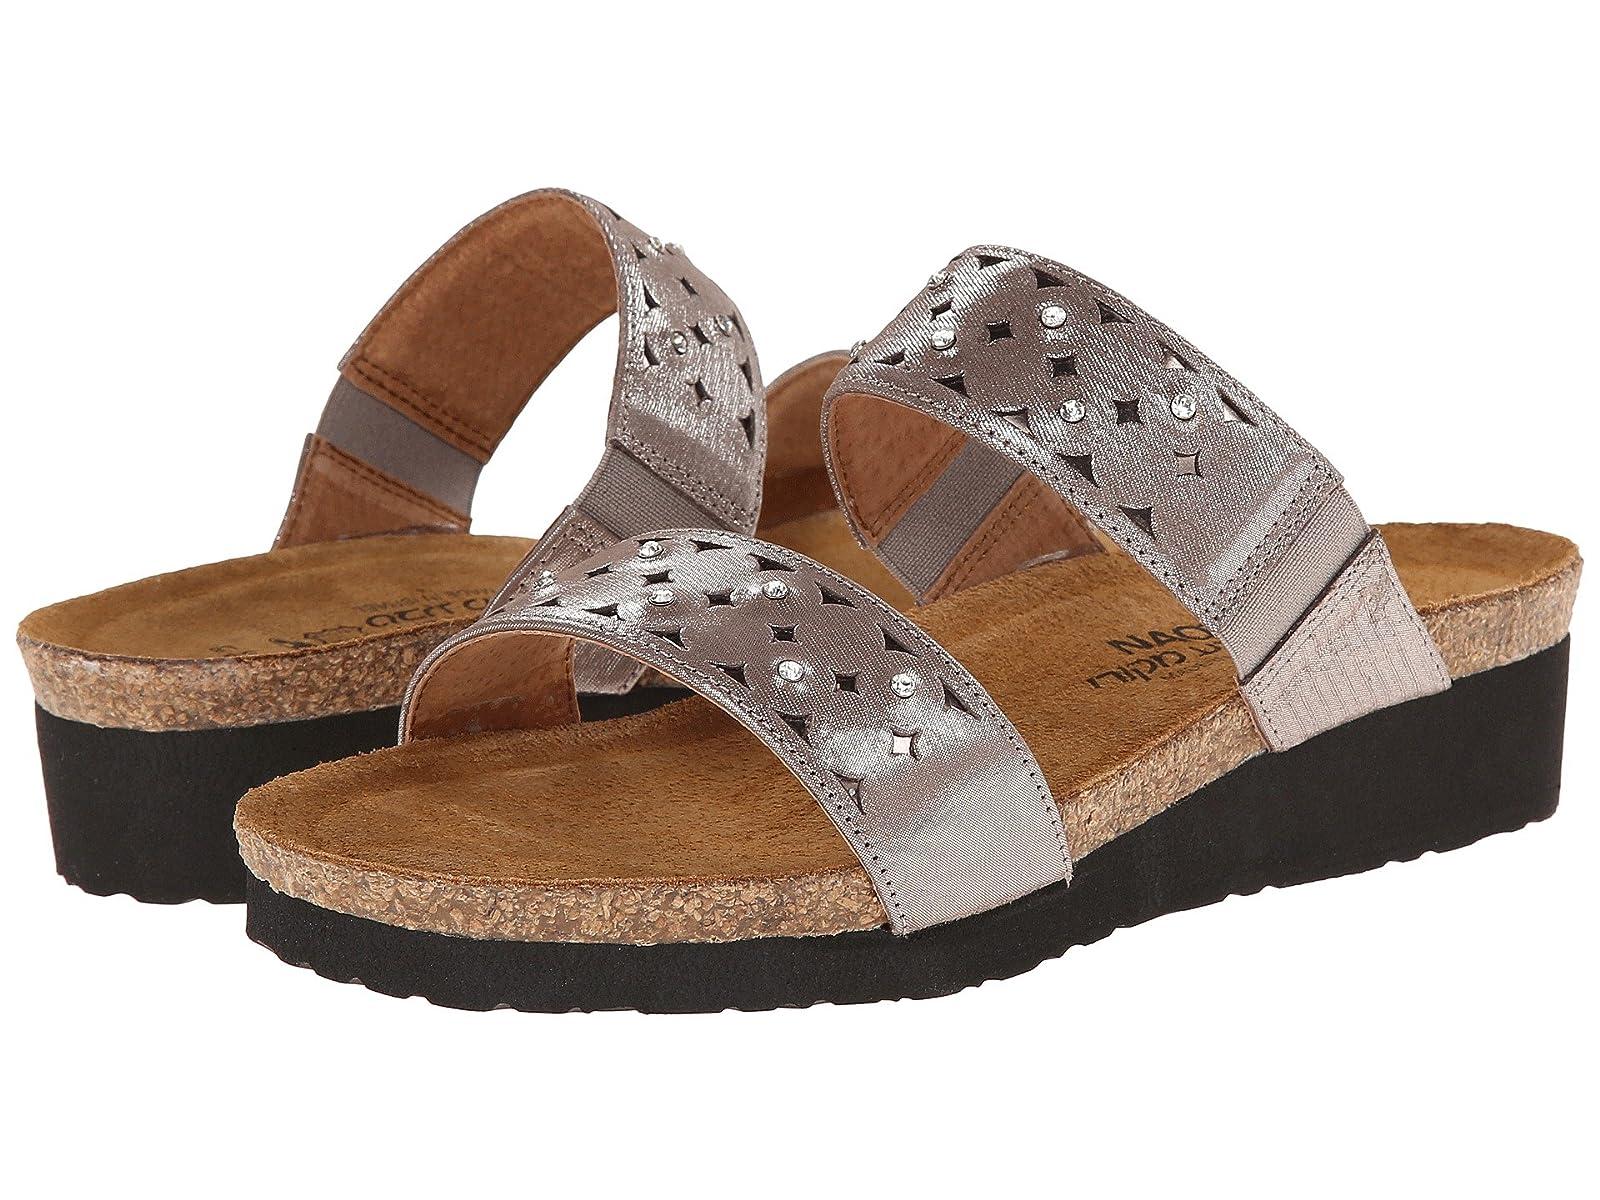 Naot SusanAtmospheric grades have affordable shoes